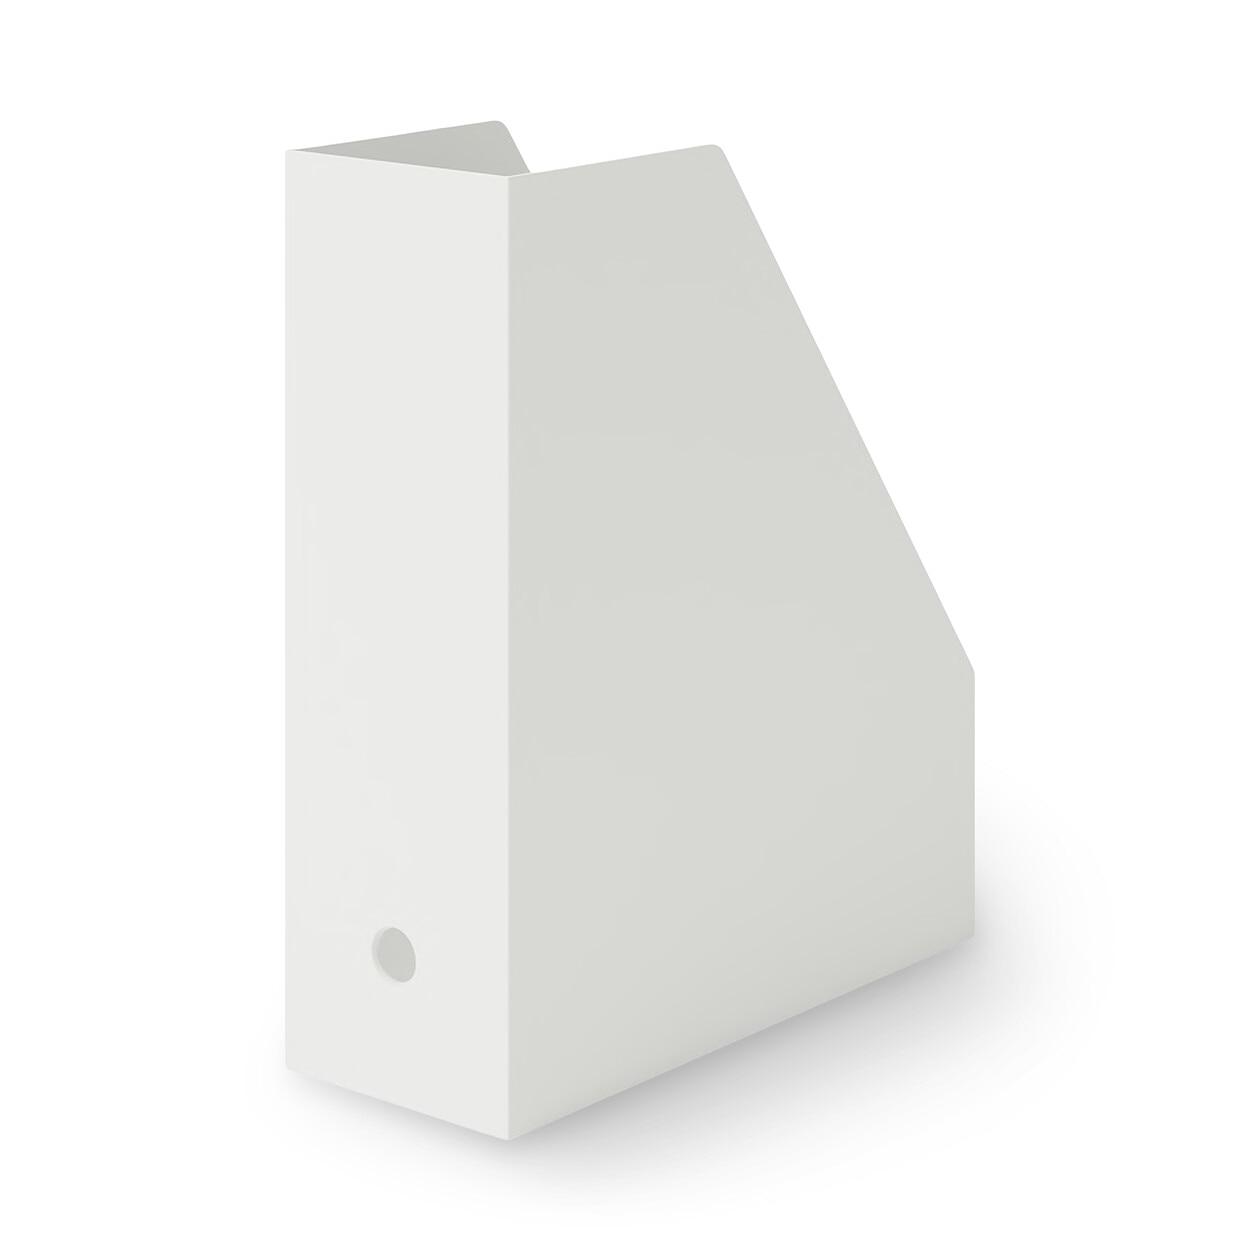 RoomClip商品情報 - ポリプロピレンスタンドファイルボックス・A4用・ホワイトグレー